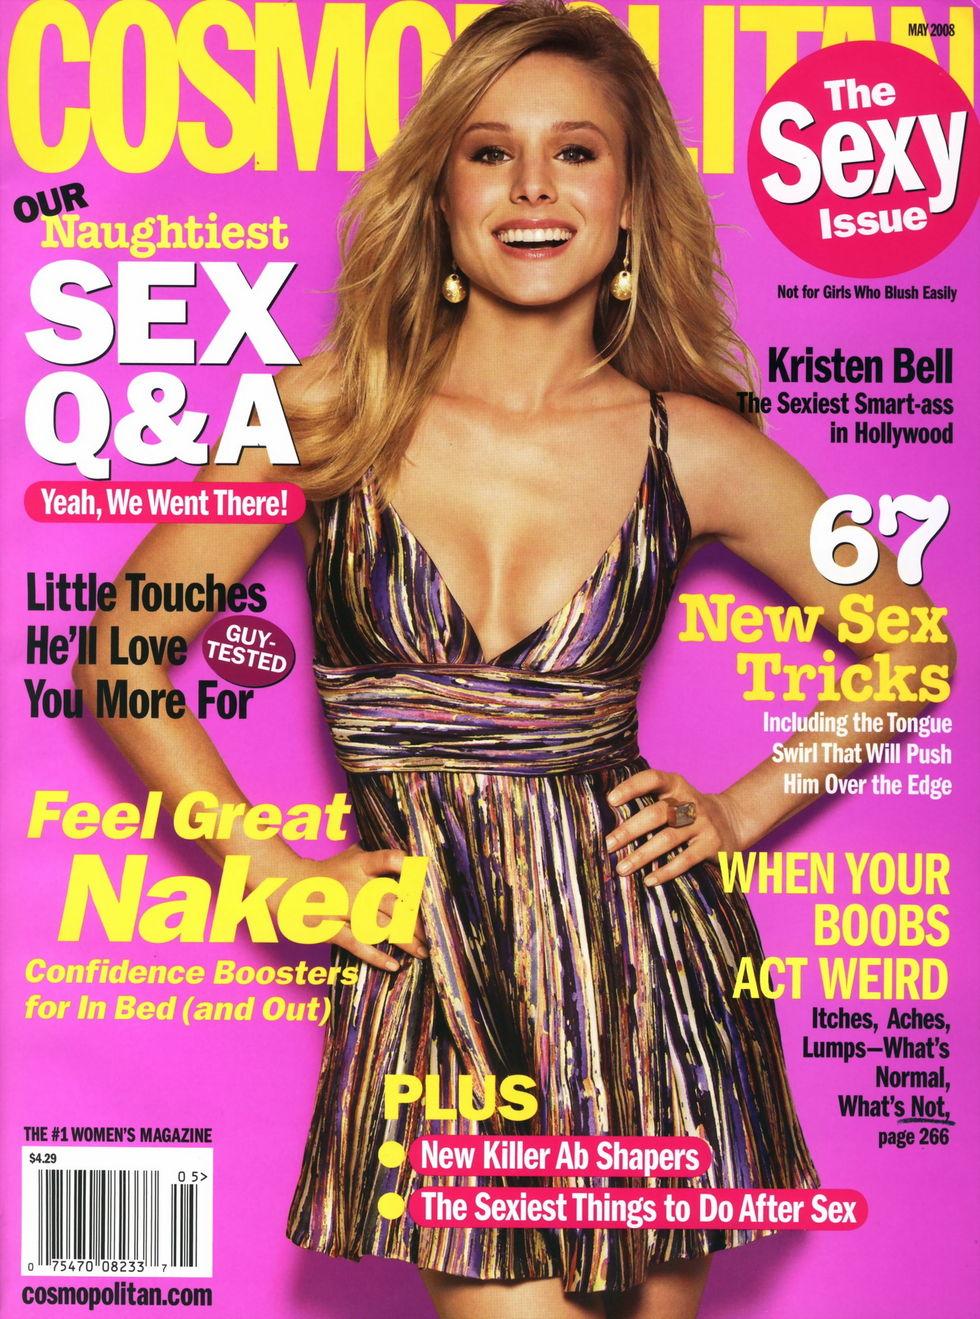 kristen-bell-cosmopolitan-magazine-may-2008-01